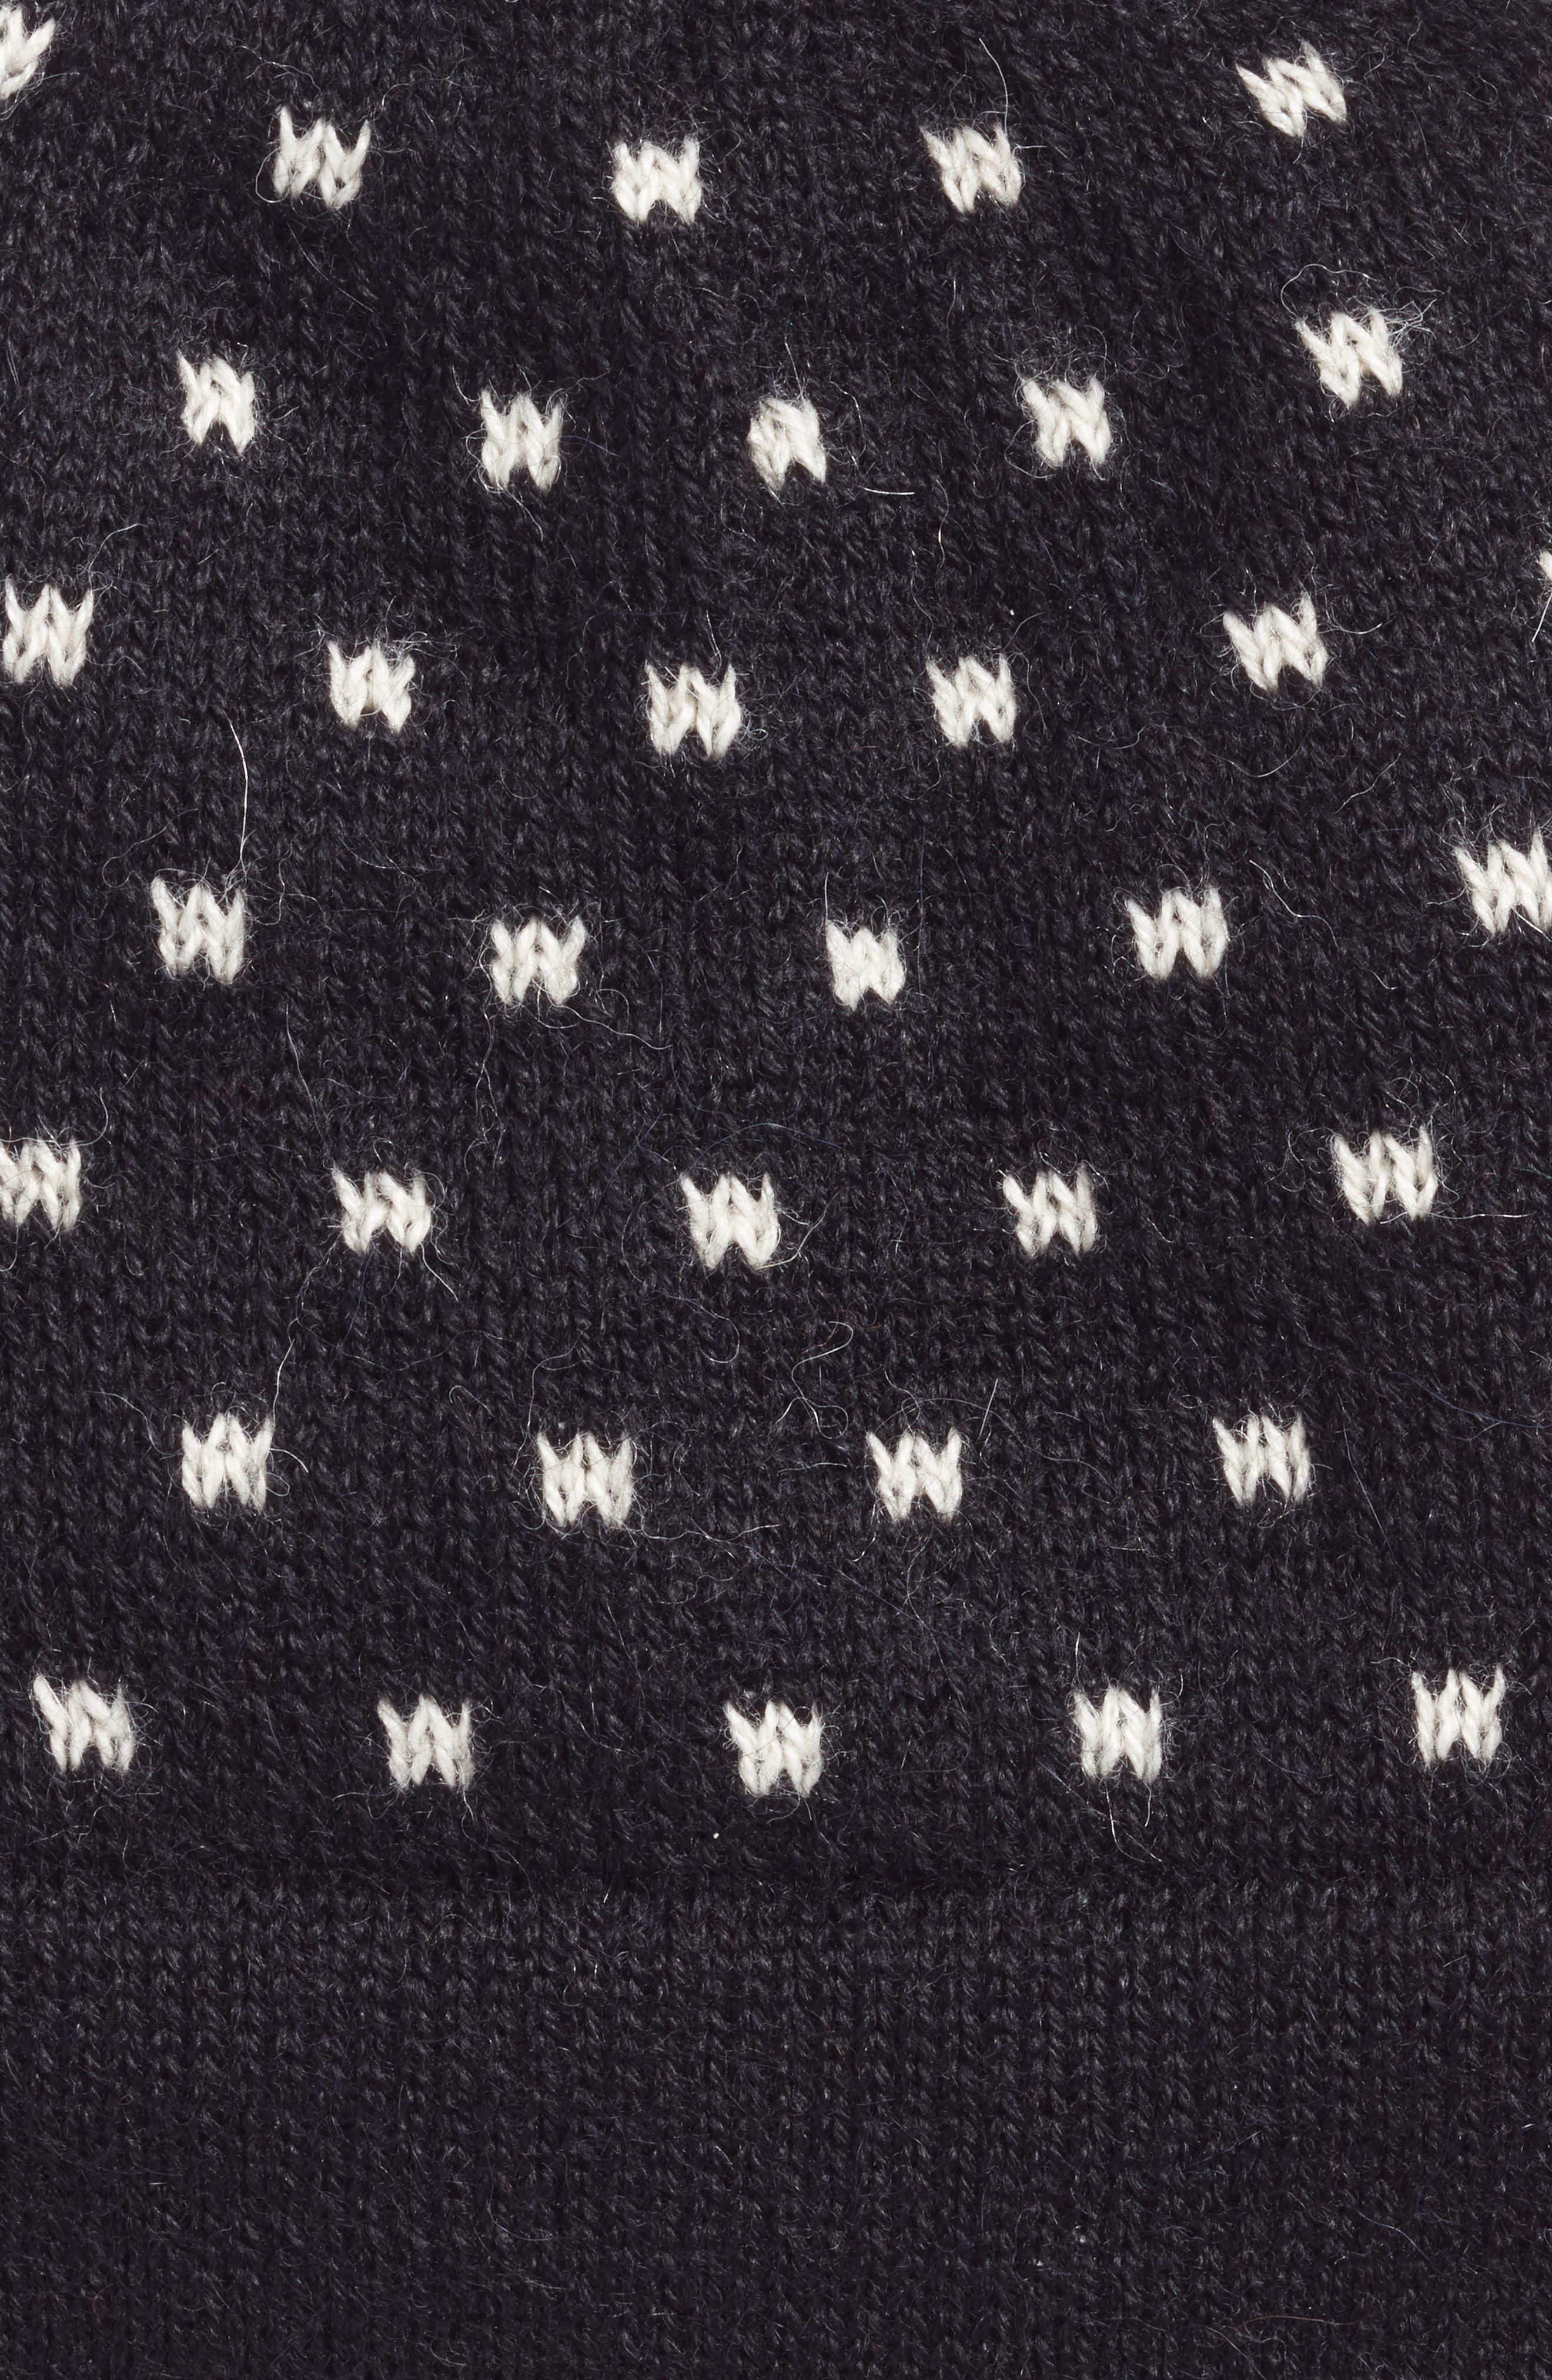 Broadway Alpaca Beanie,                             Alternate thumbnail 2, color,                             BLACK/ WHITE